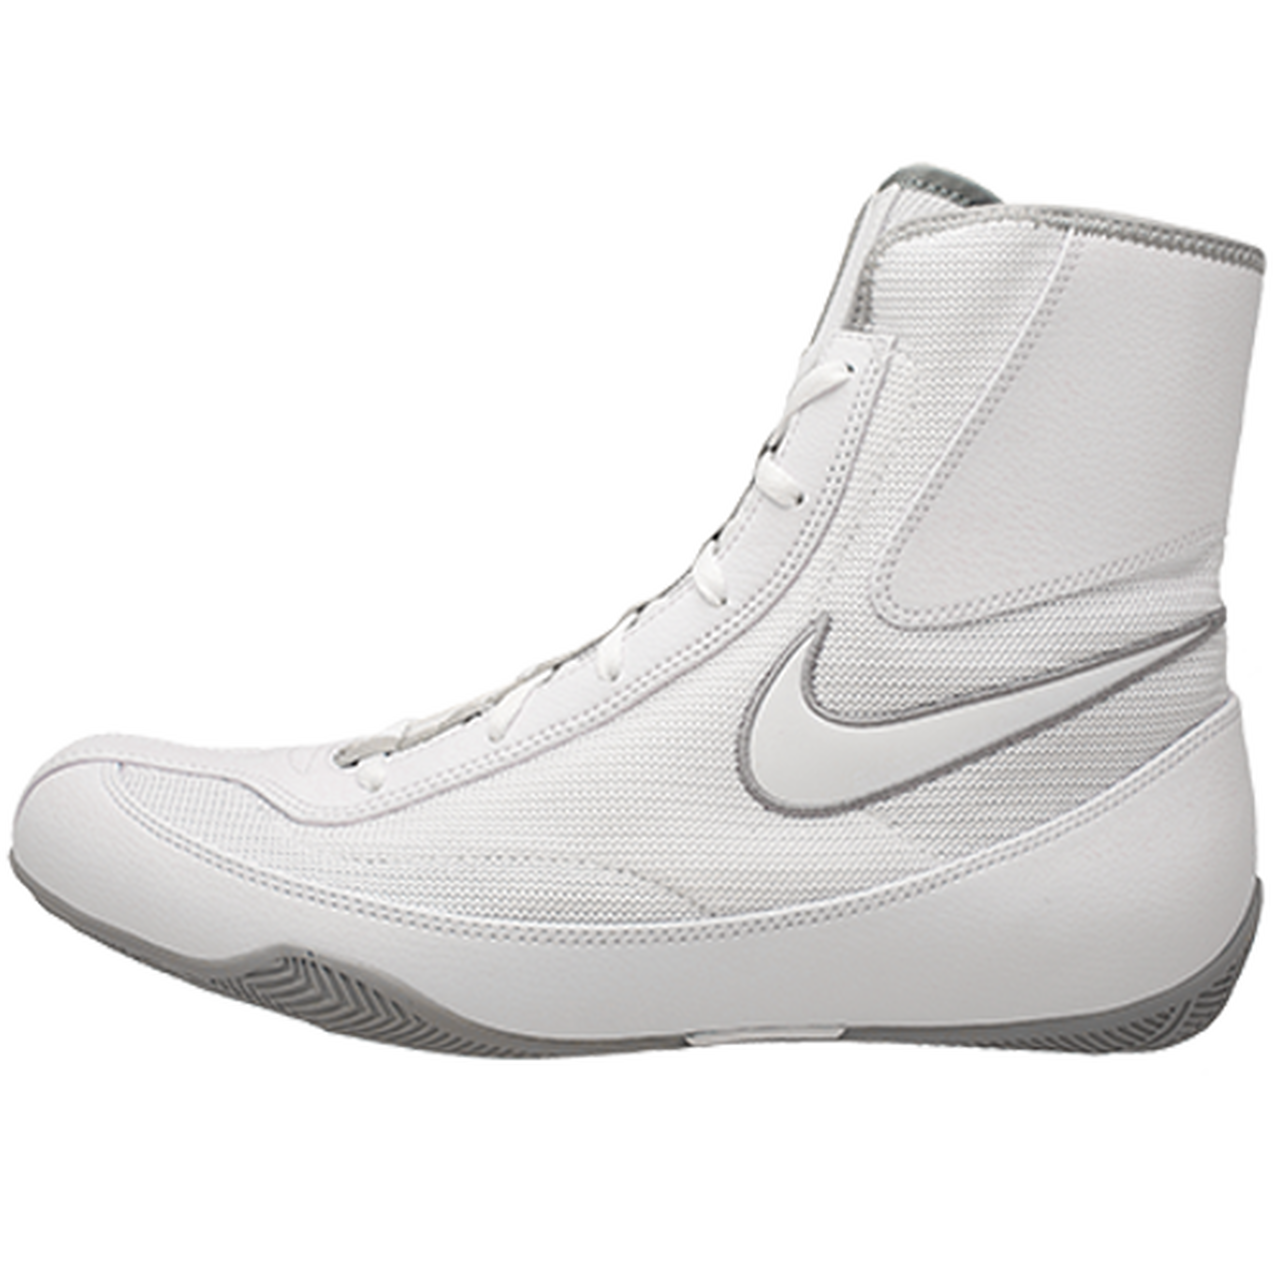 Nike Machomai 2.0 White Boxing Shoes